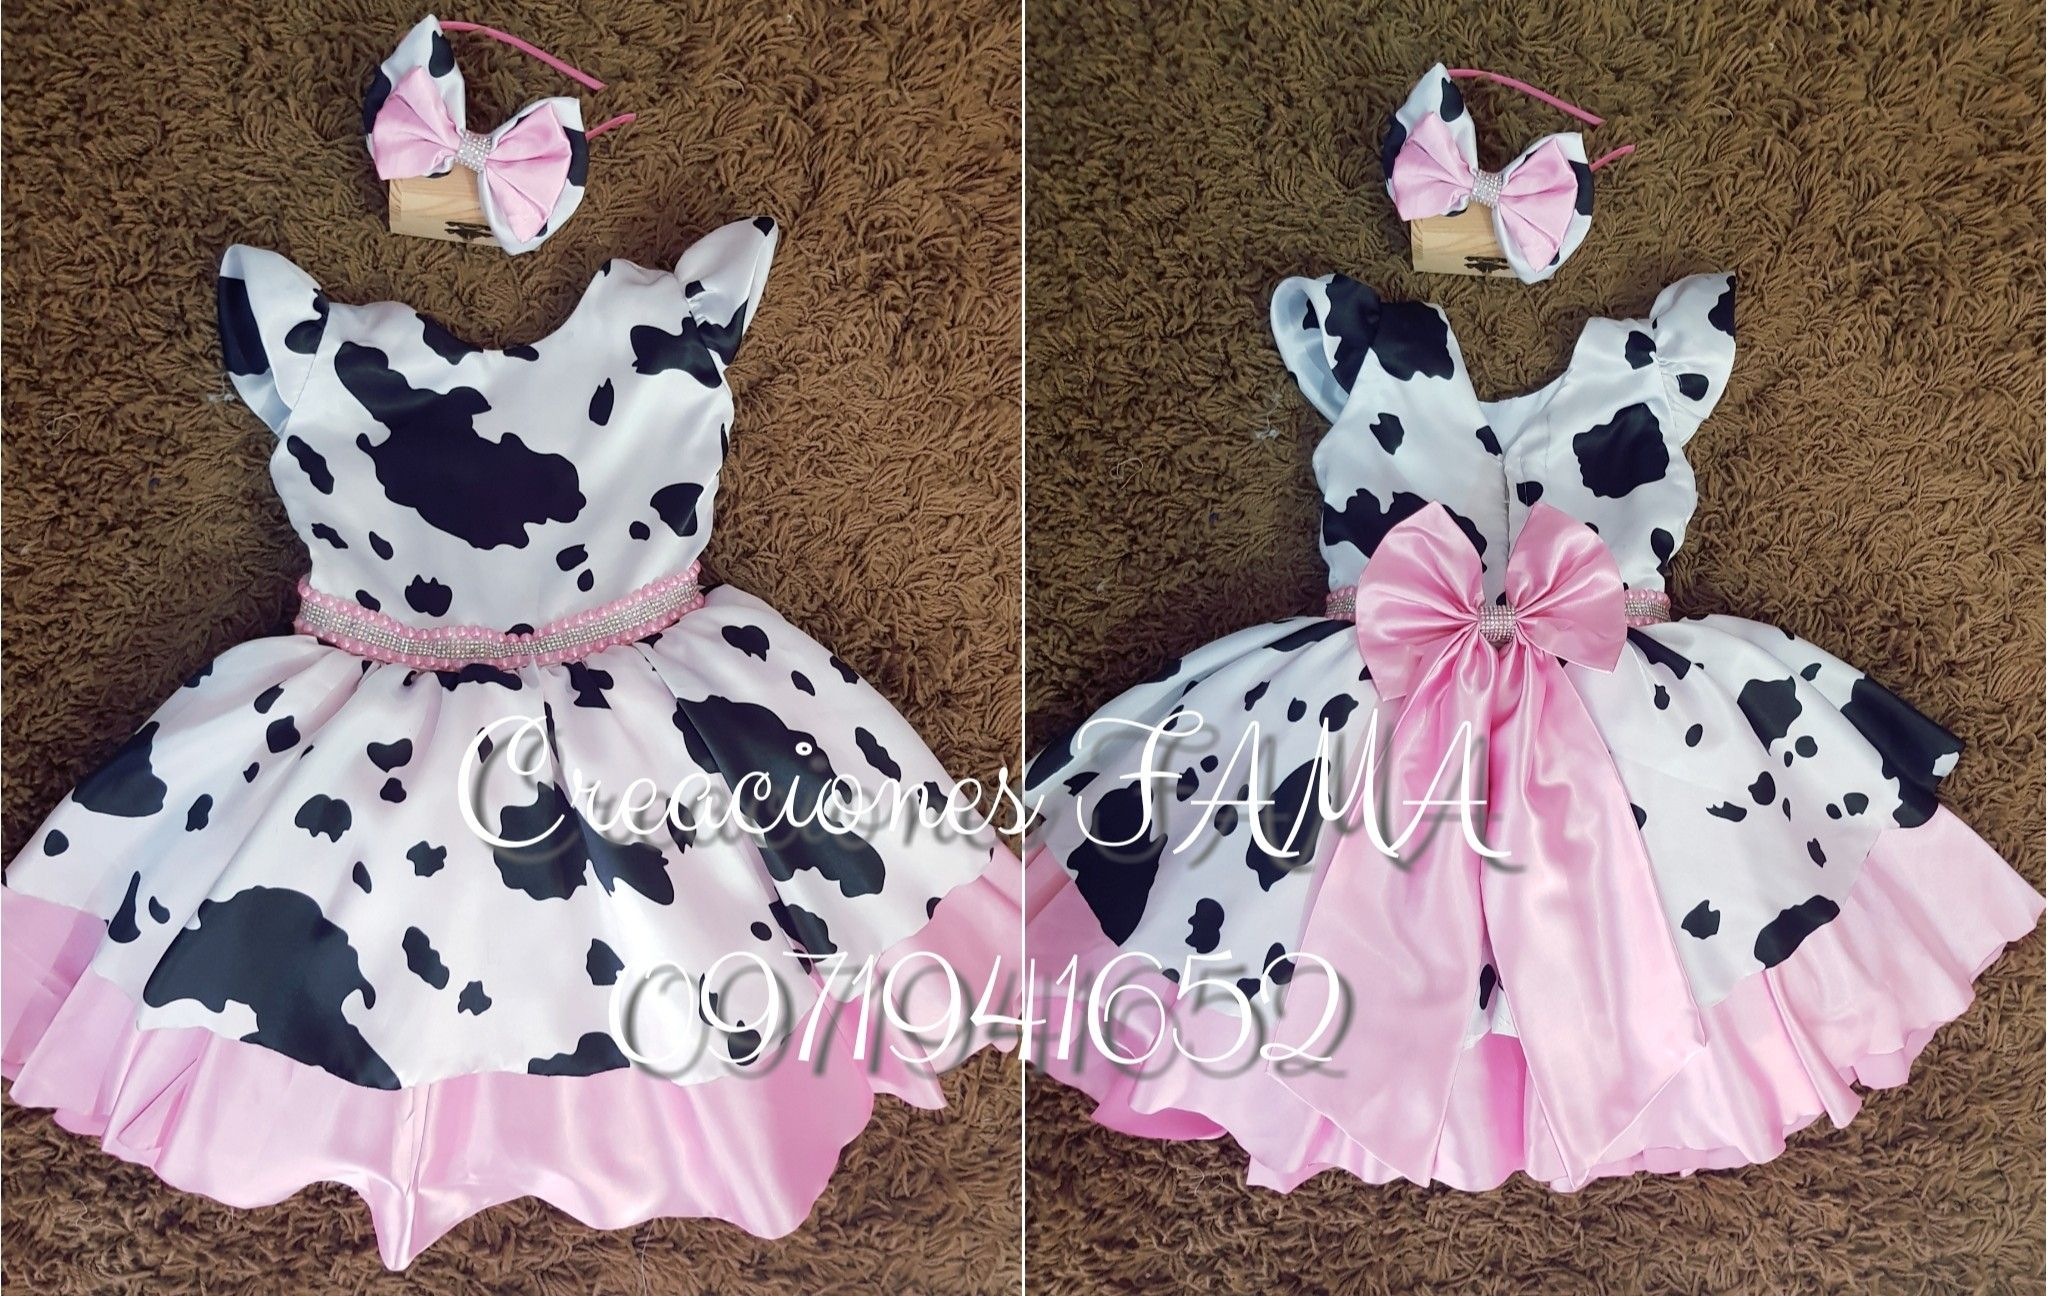 La vaca lola set Birthday girl outfit  la vaca lola  baby girl first birthday